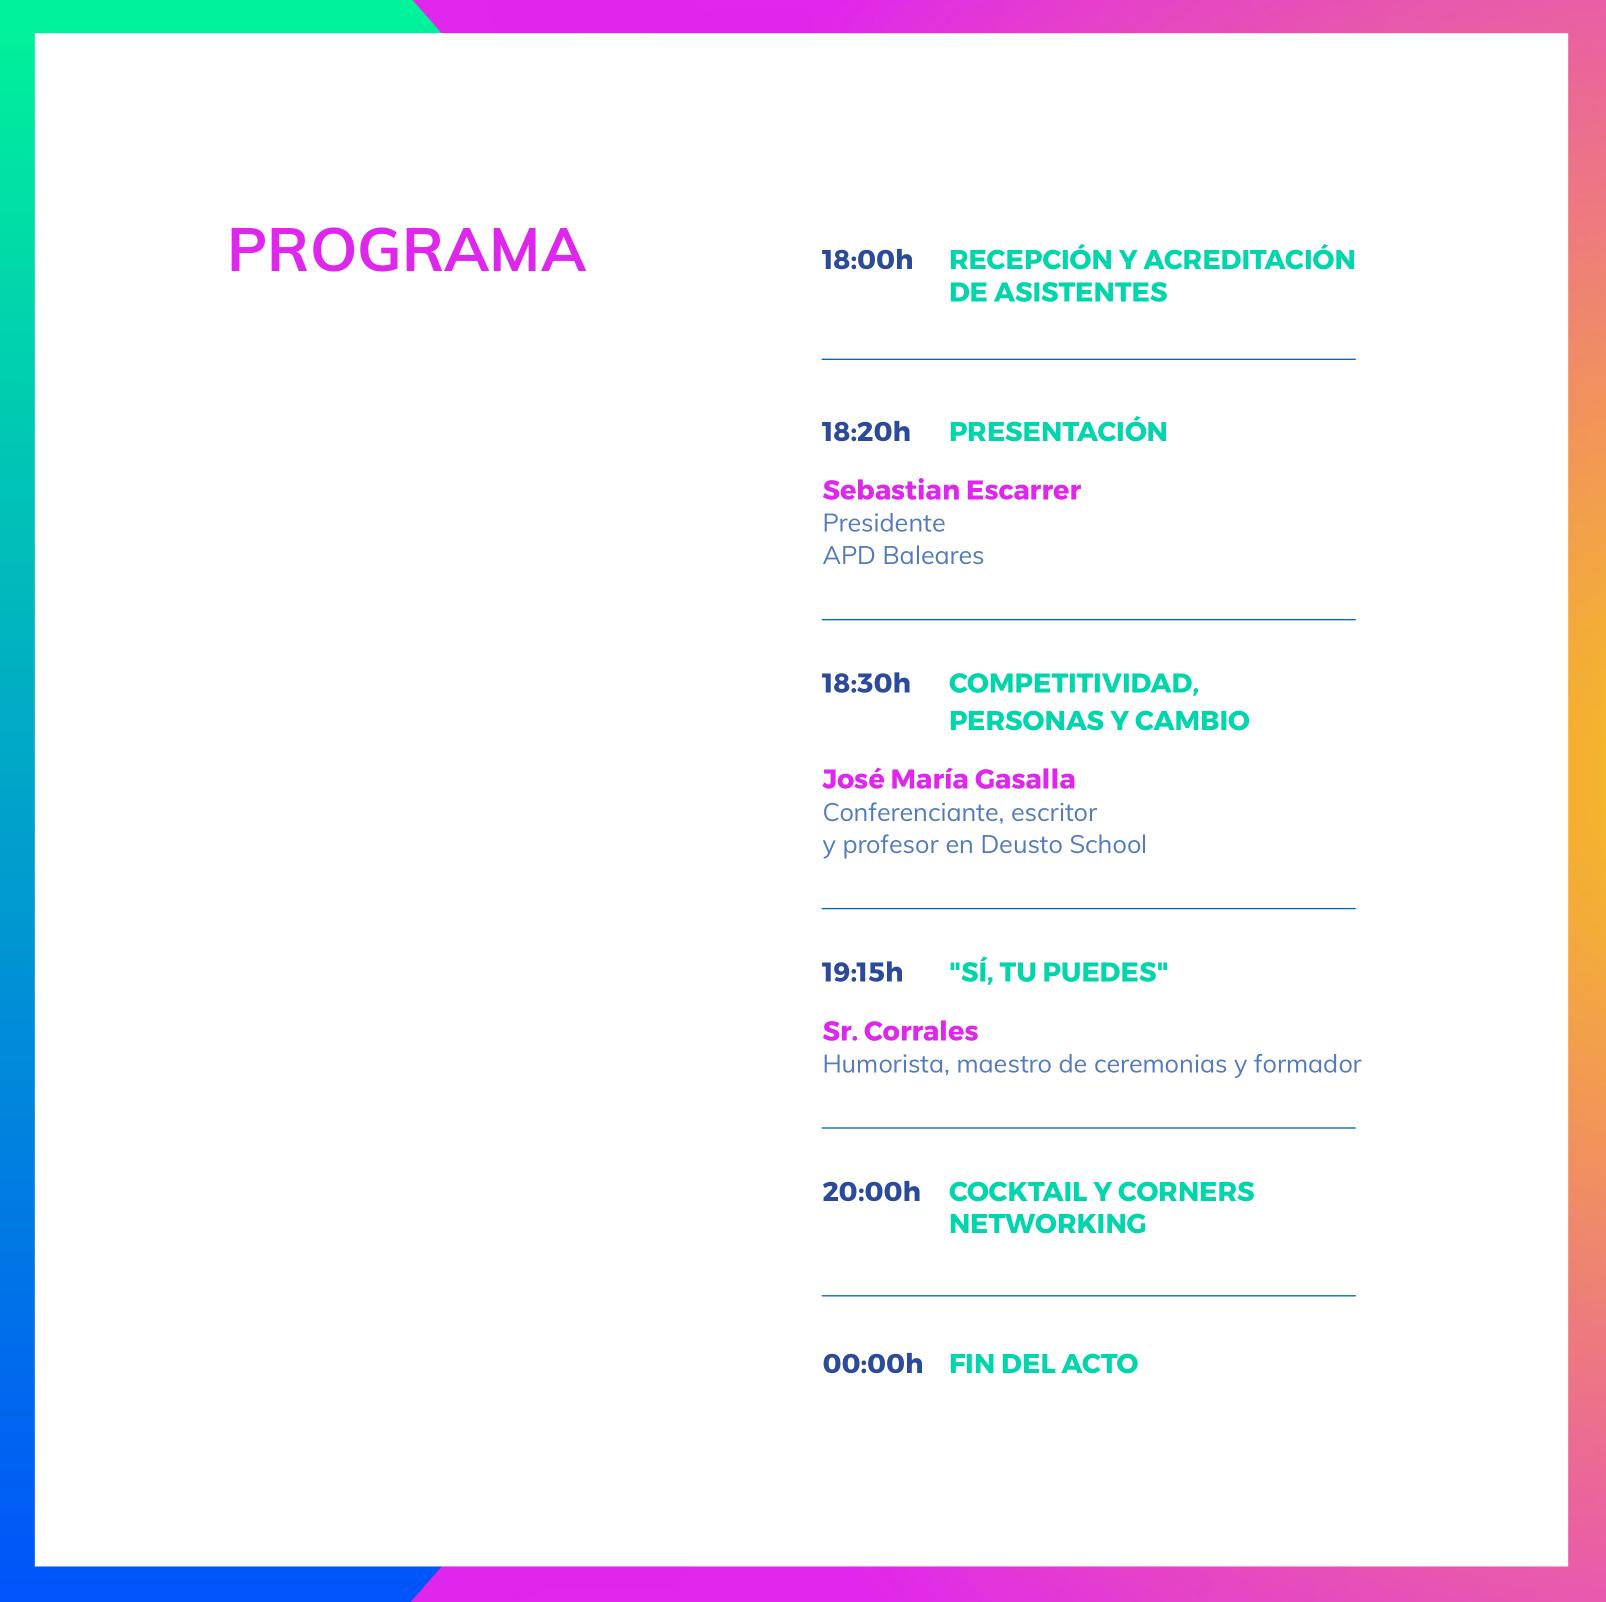 programa-afterwork-apd